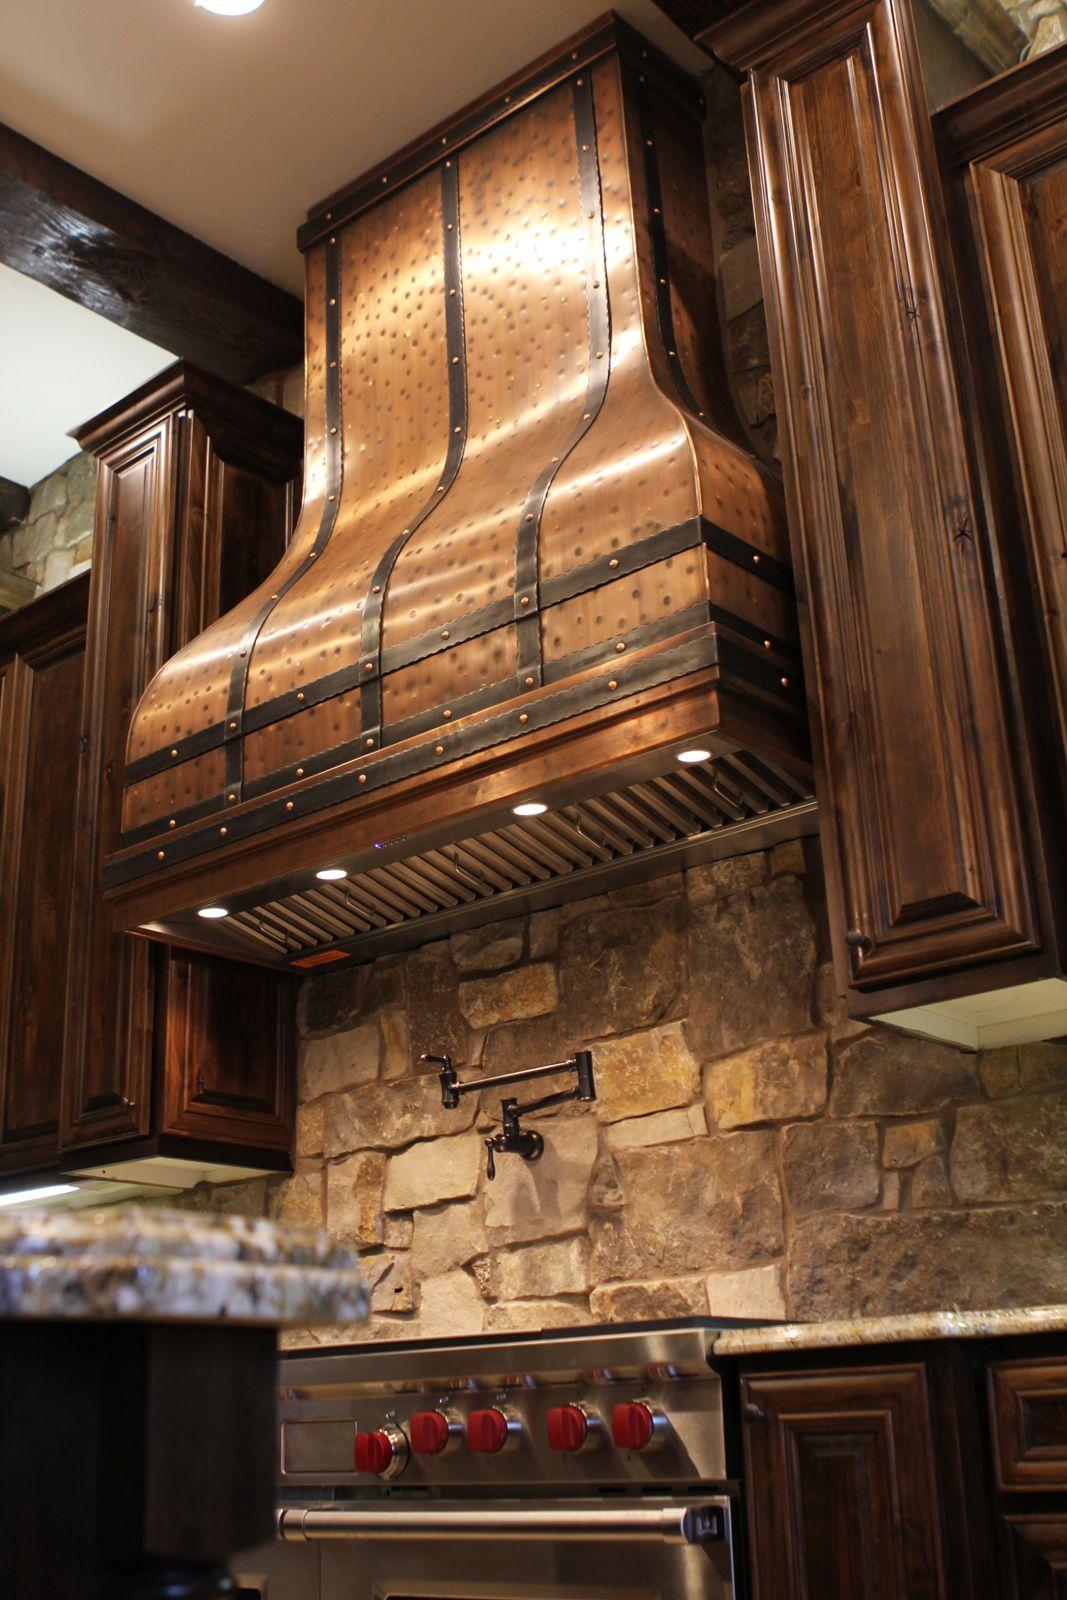 Art Of Rain Hood Sets Off This Beautiful Kitchen Copper Rangehood